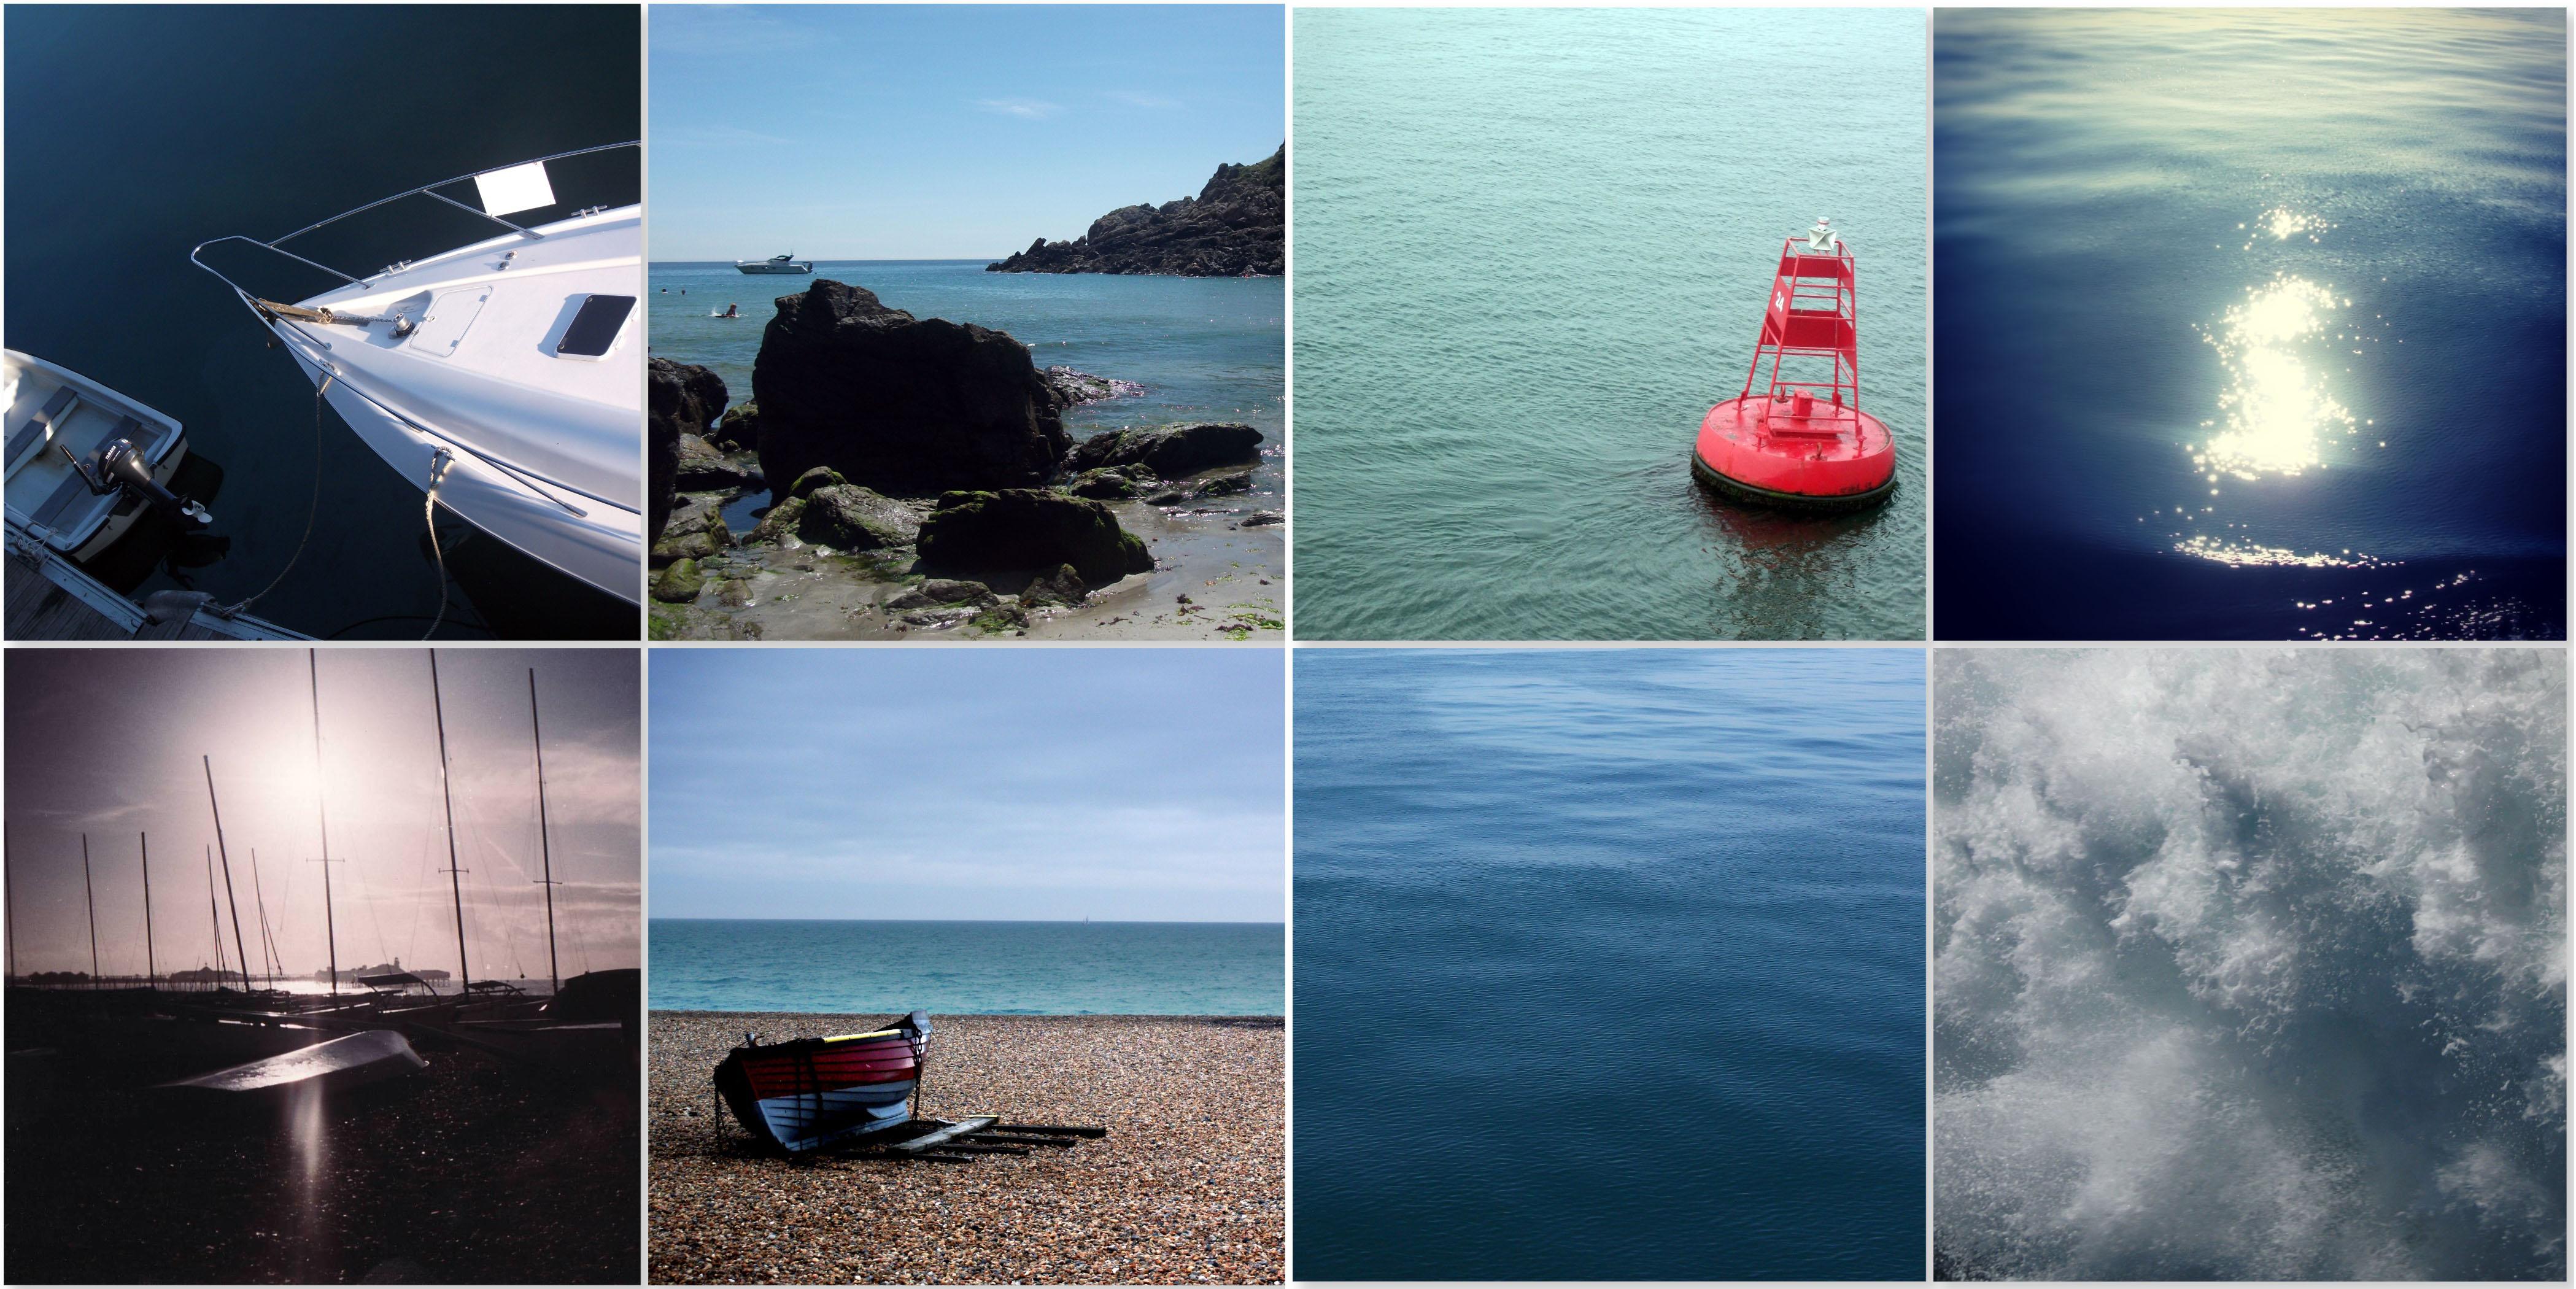 Boats-and-Ocean-The-Last-Krystallos